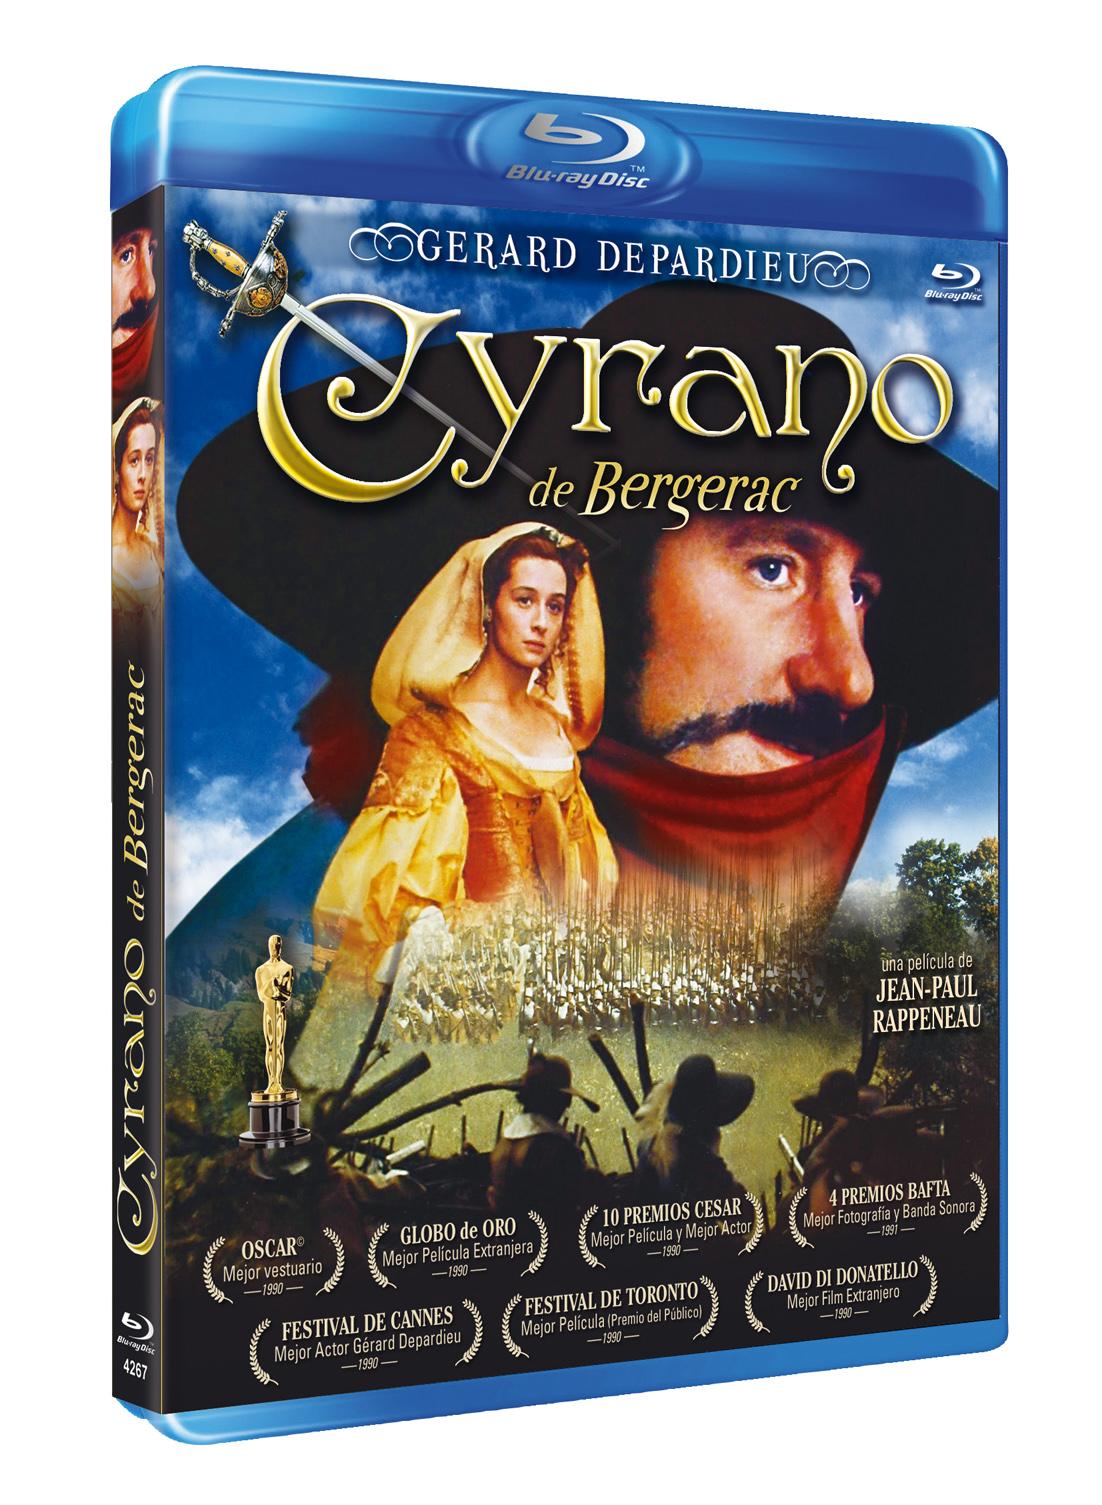 Cyriano de Bergerac